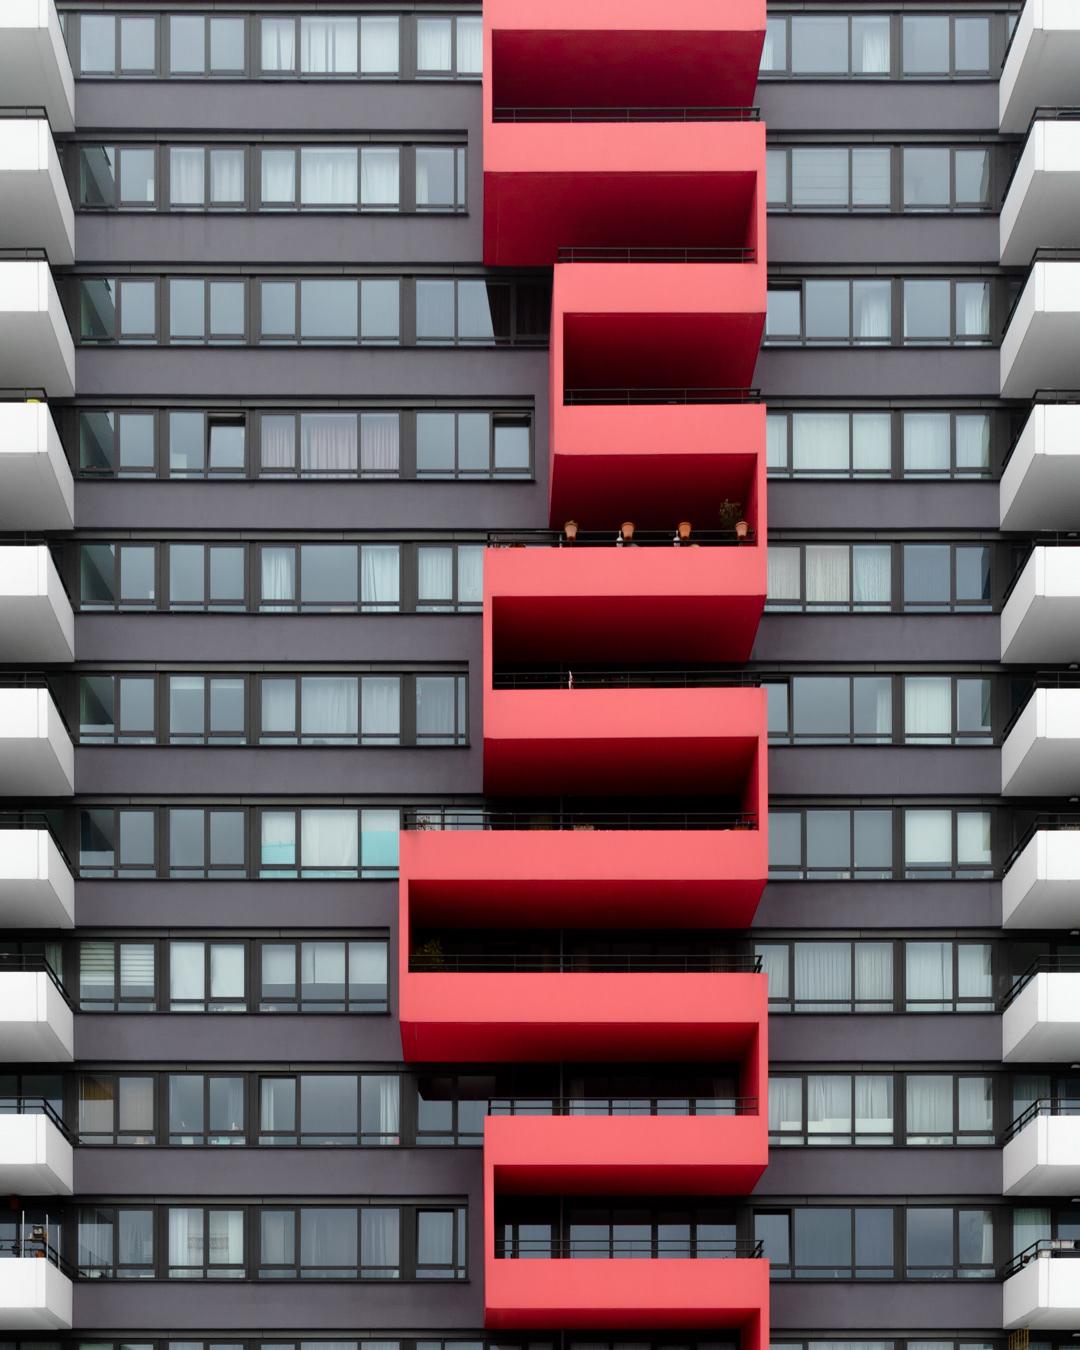 Snake like balcony pattern found in Utrecht, The Netherlands